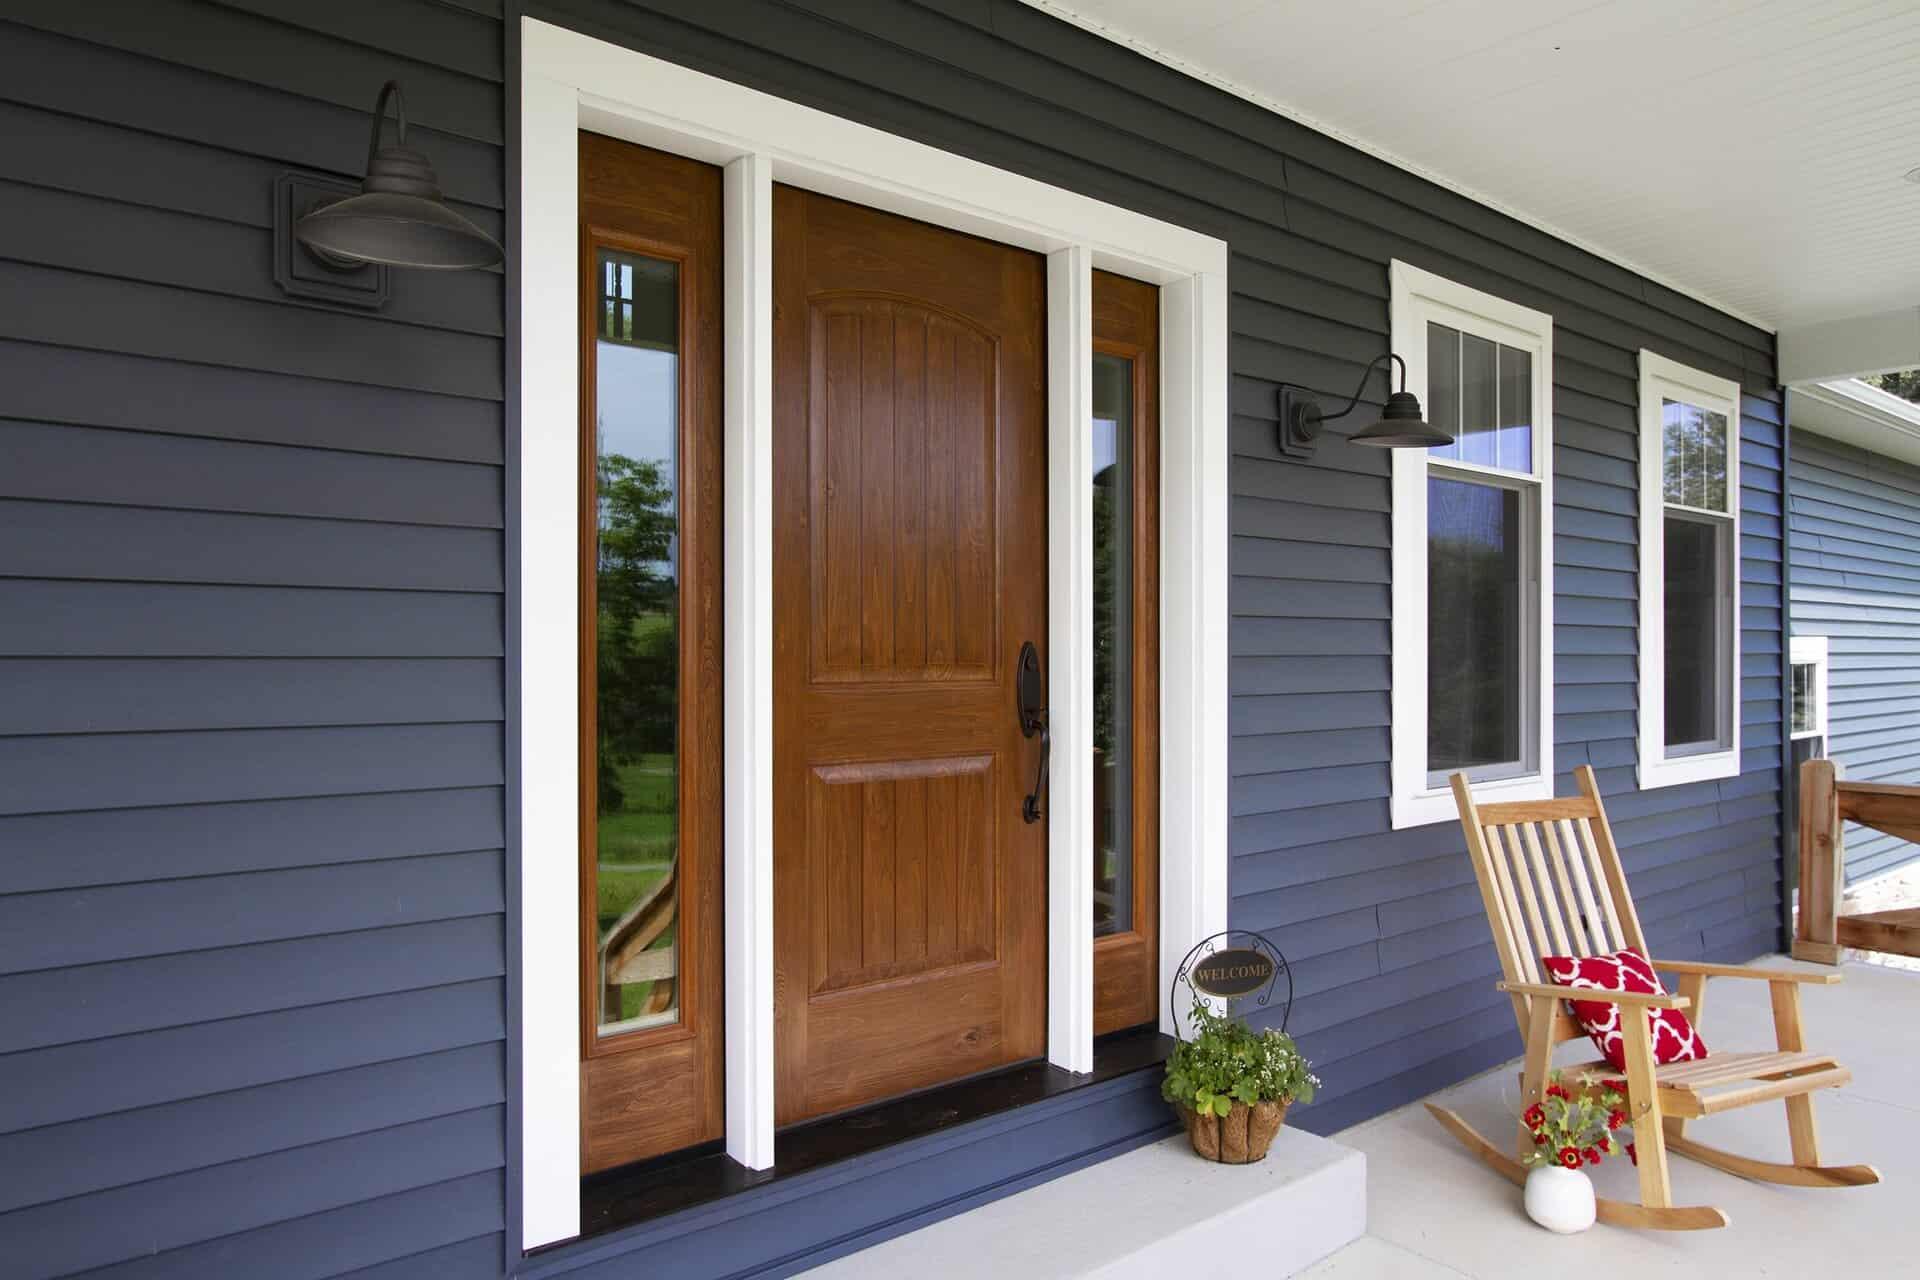 signet-fiberglass-door-by-provia-in-knotty-alder-ginger-stain-8-002